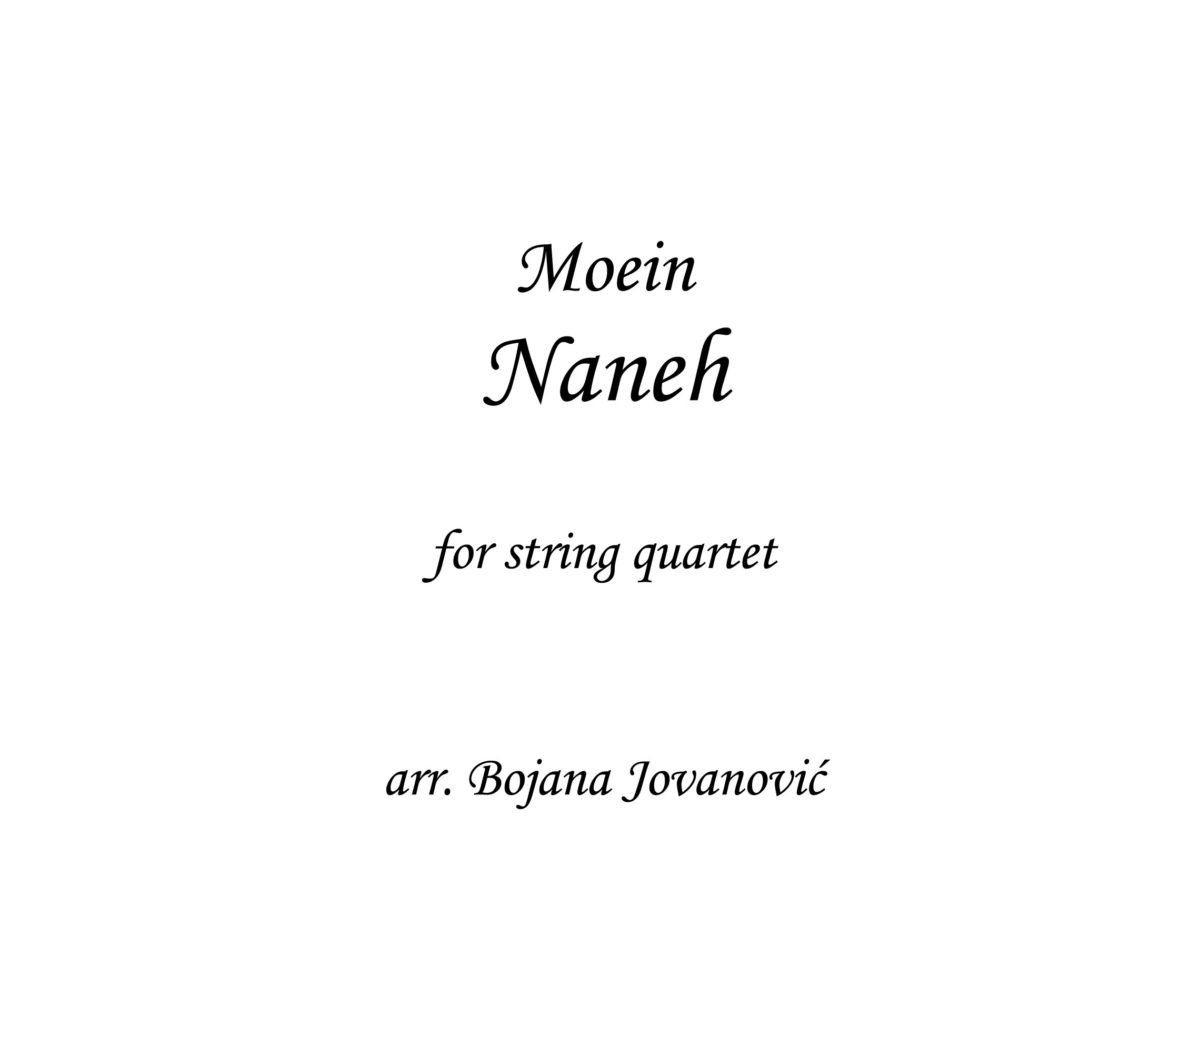 Naneh Moein Sheet music